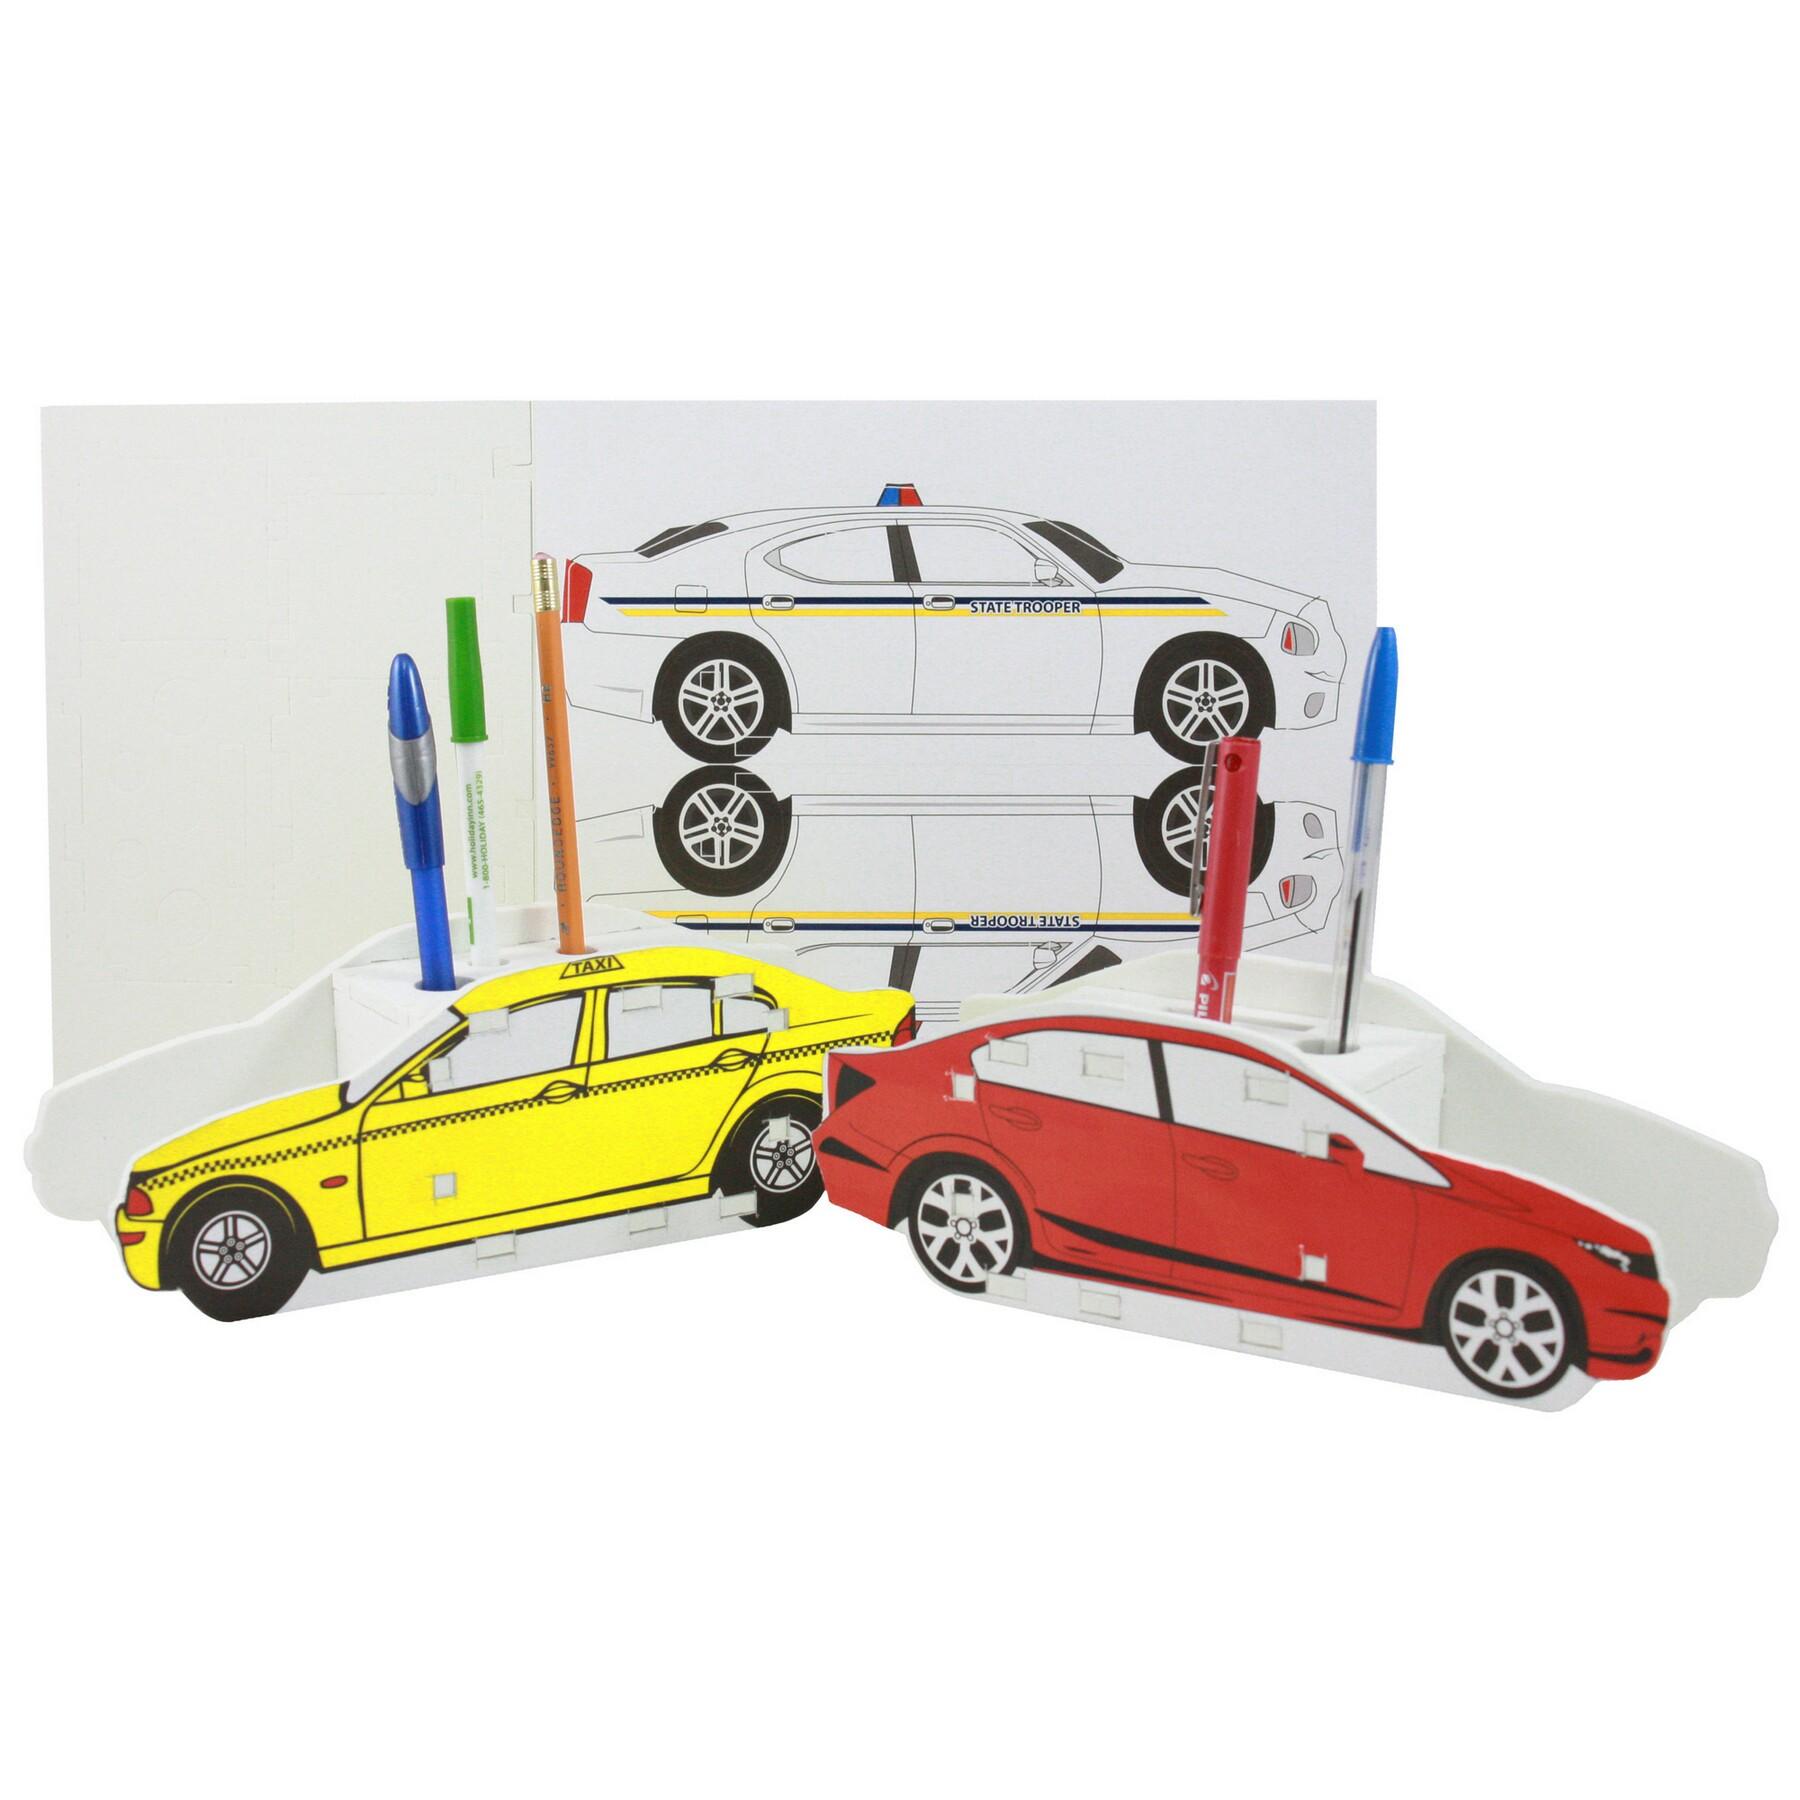 Foam Car Puzzle Organizer, CUCAR502, 1 Colour Imprint